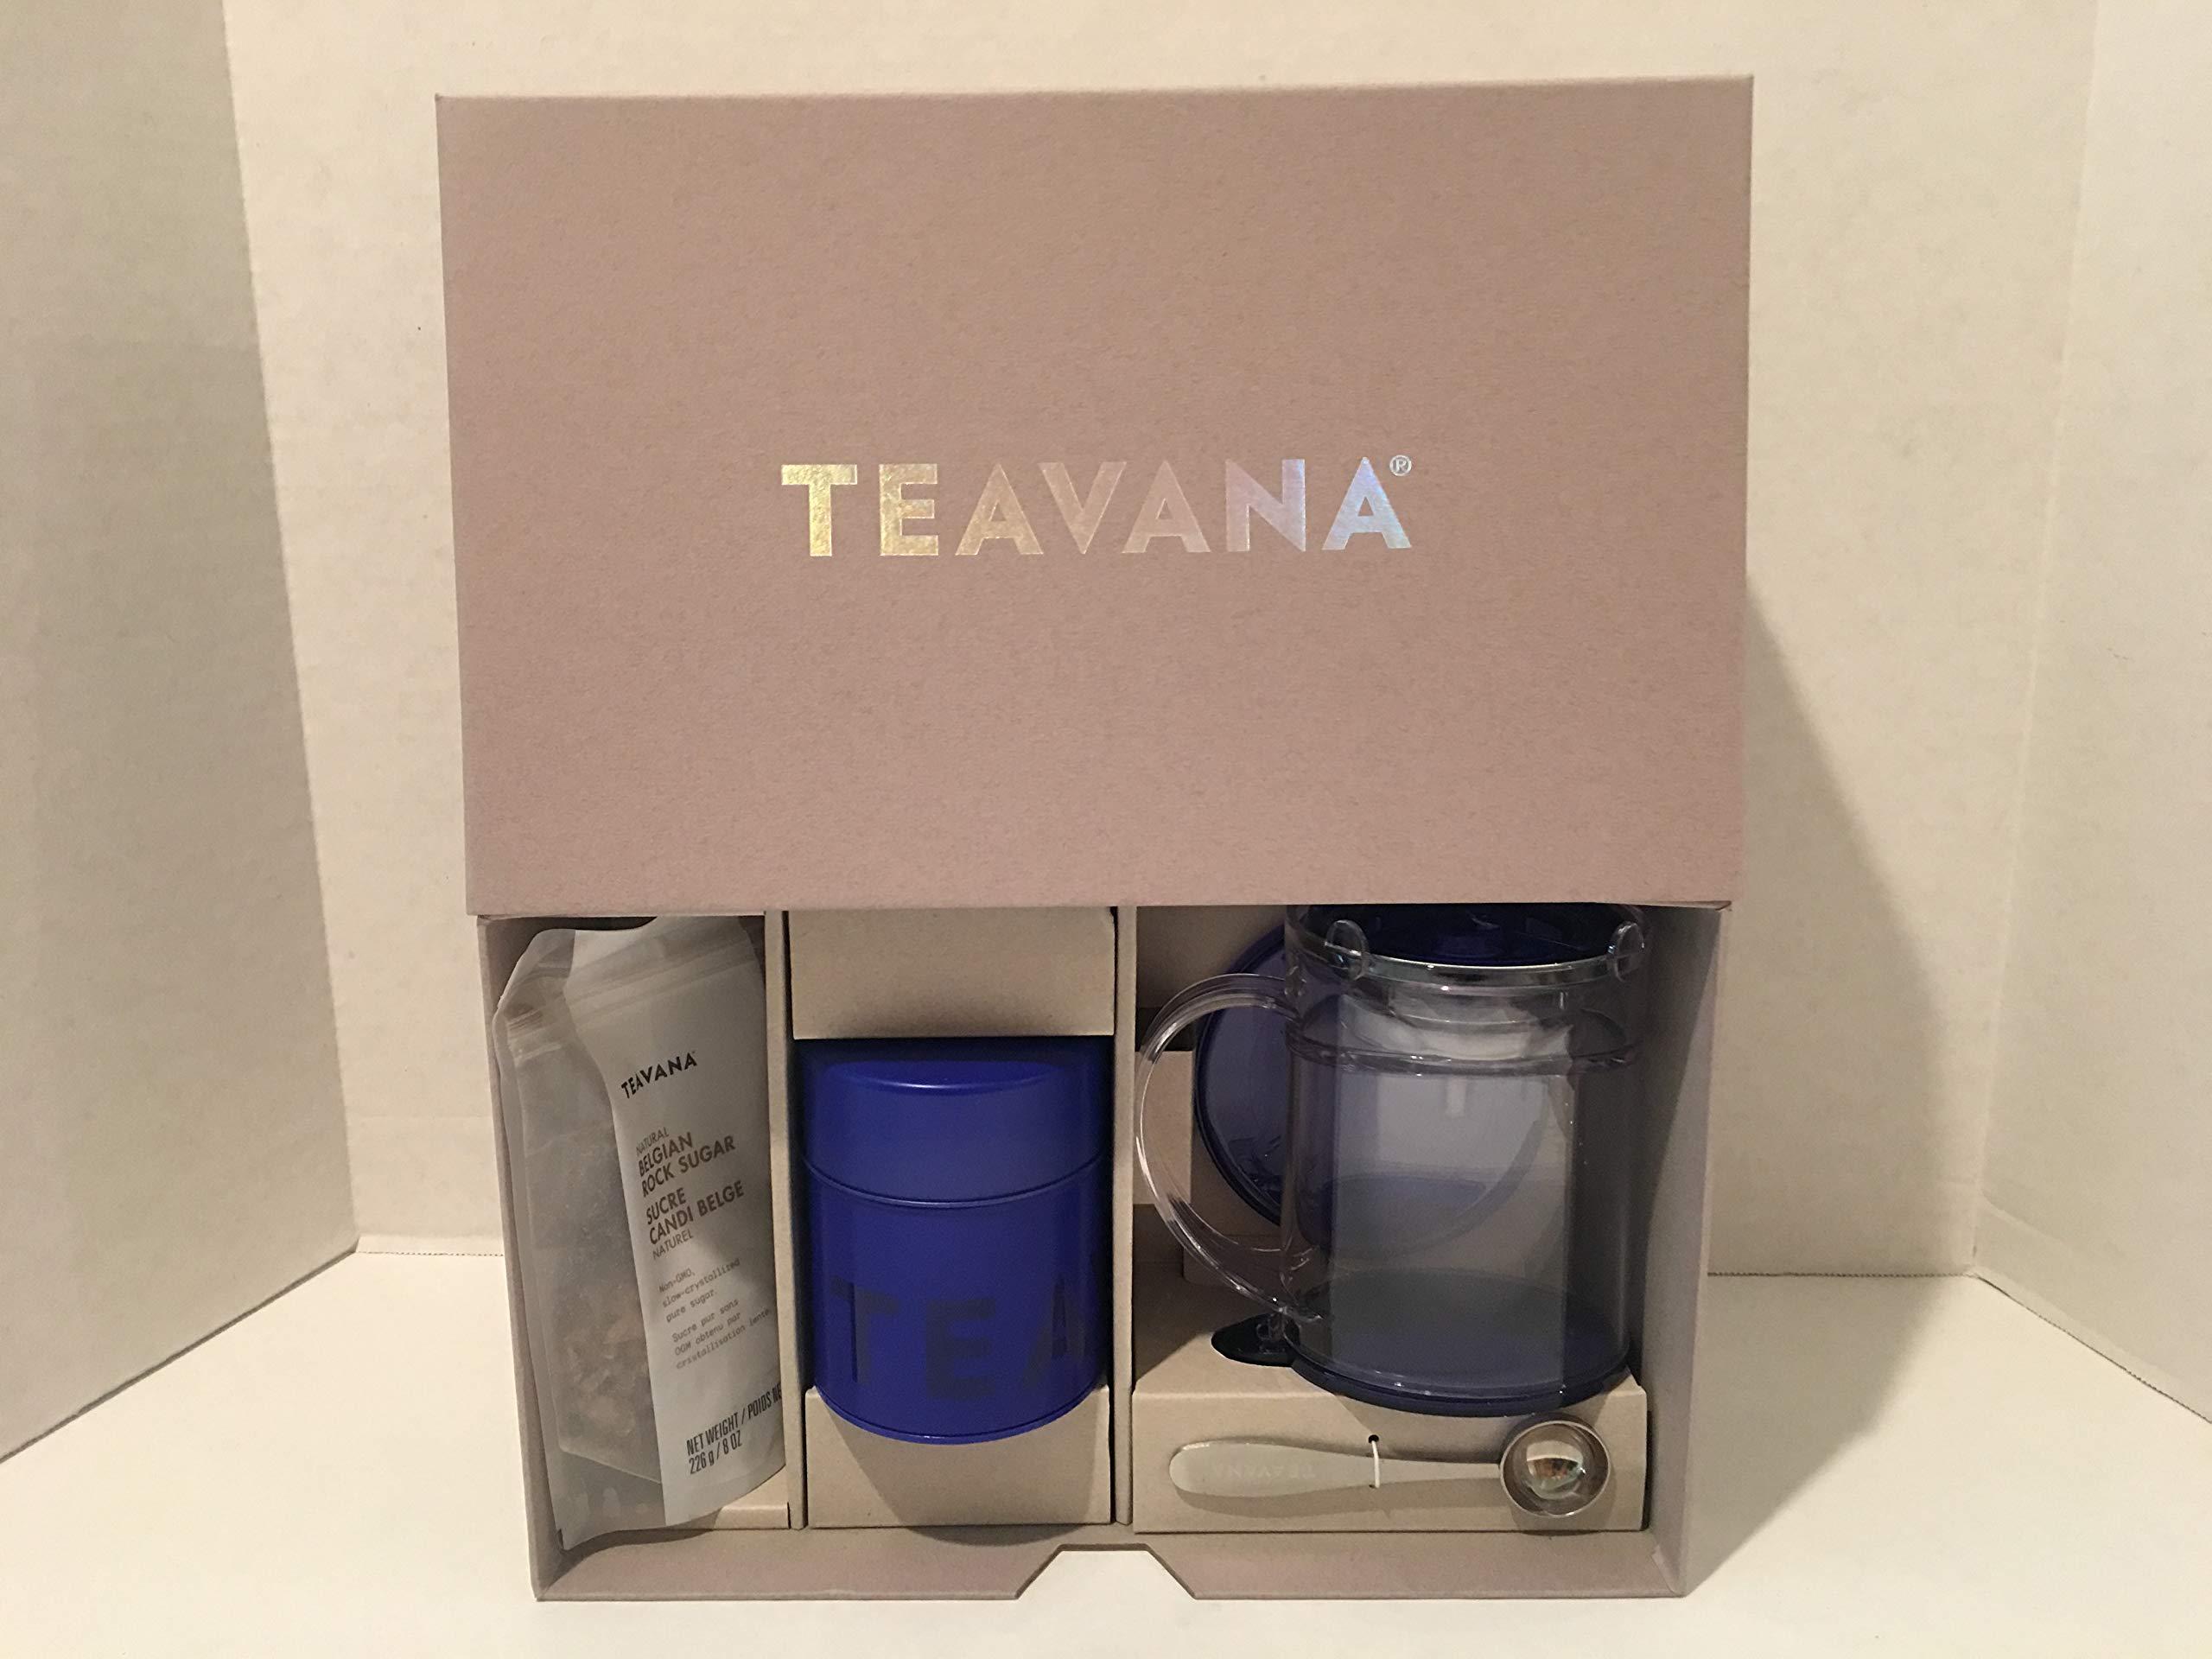 Teavana Start Steeping Starter Brewing Kit (Blue Perfectea Maker, Tea Tin, Scoop and Belgian Rock Sugar)